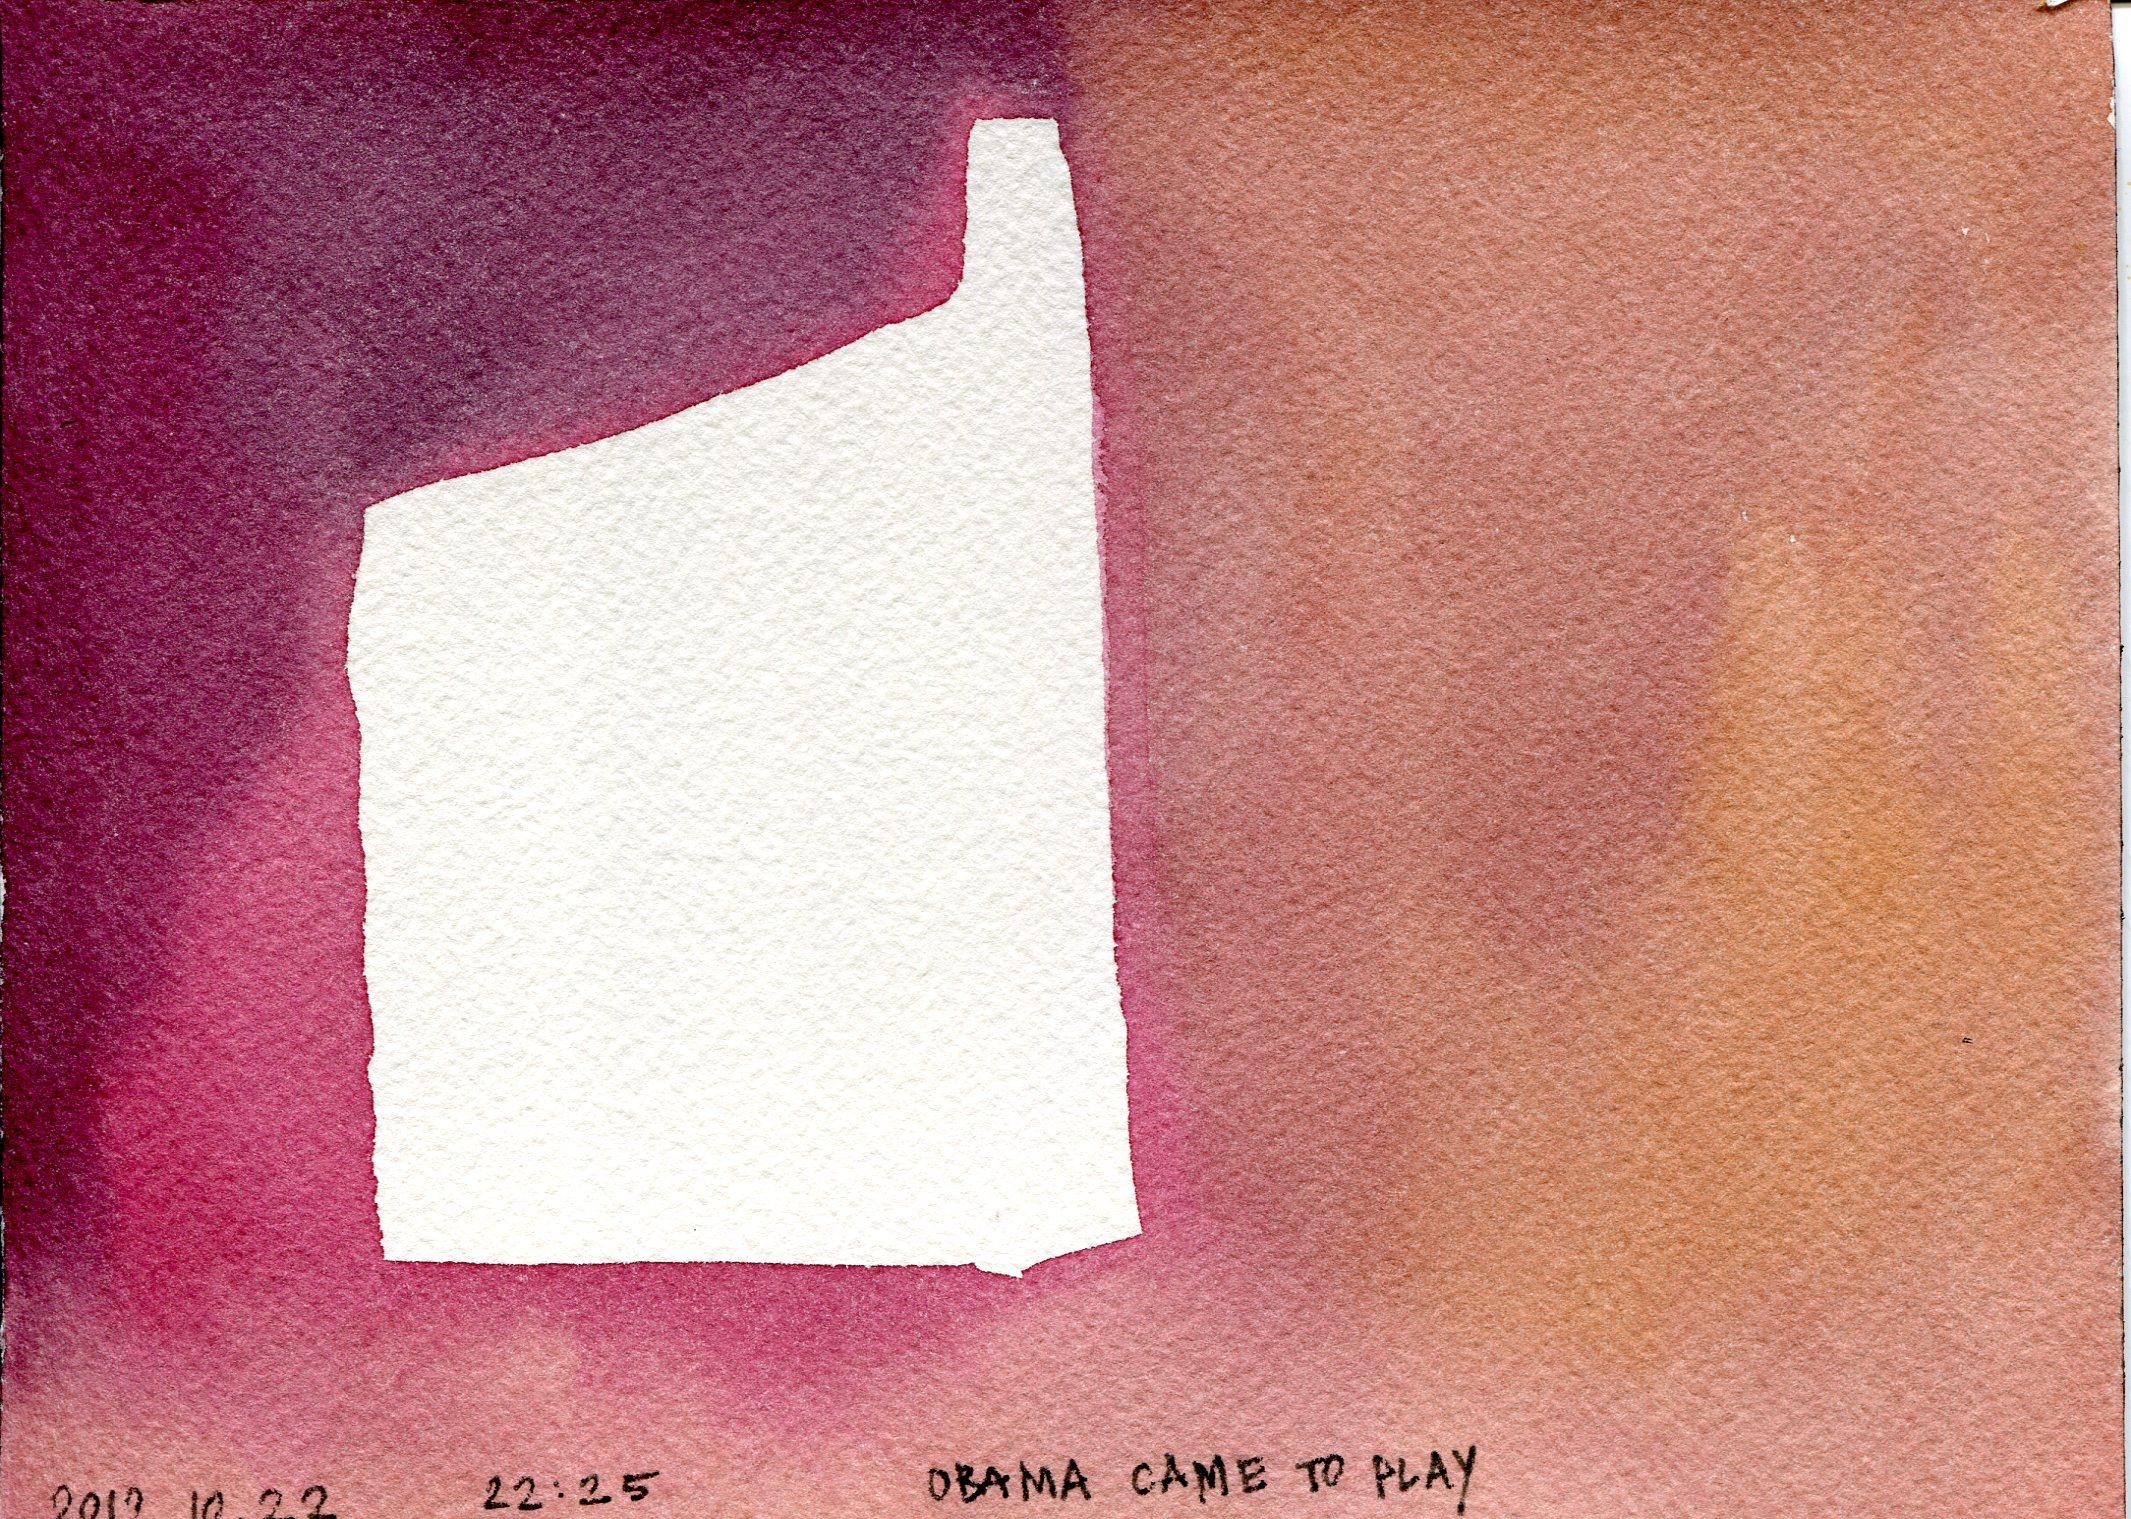 2012-10-30 drawing002.jpg